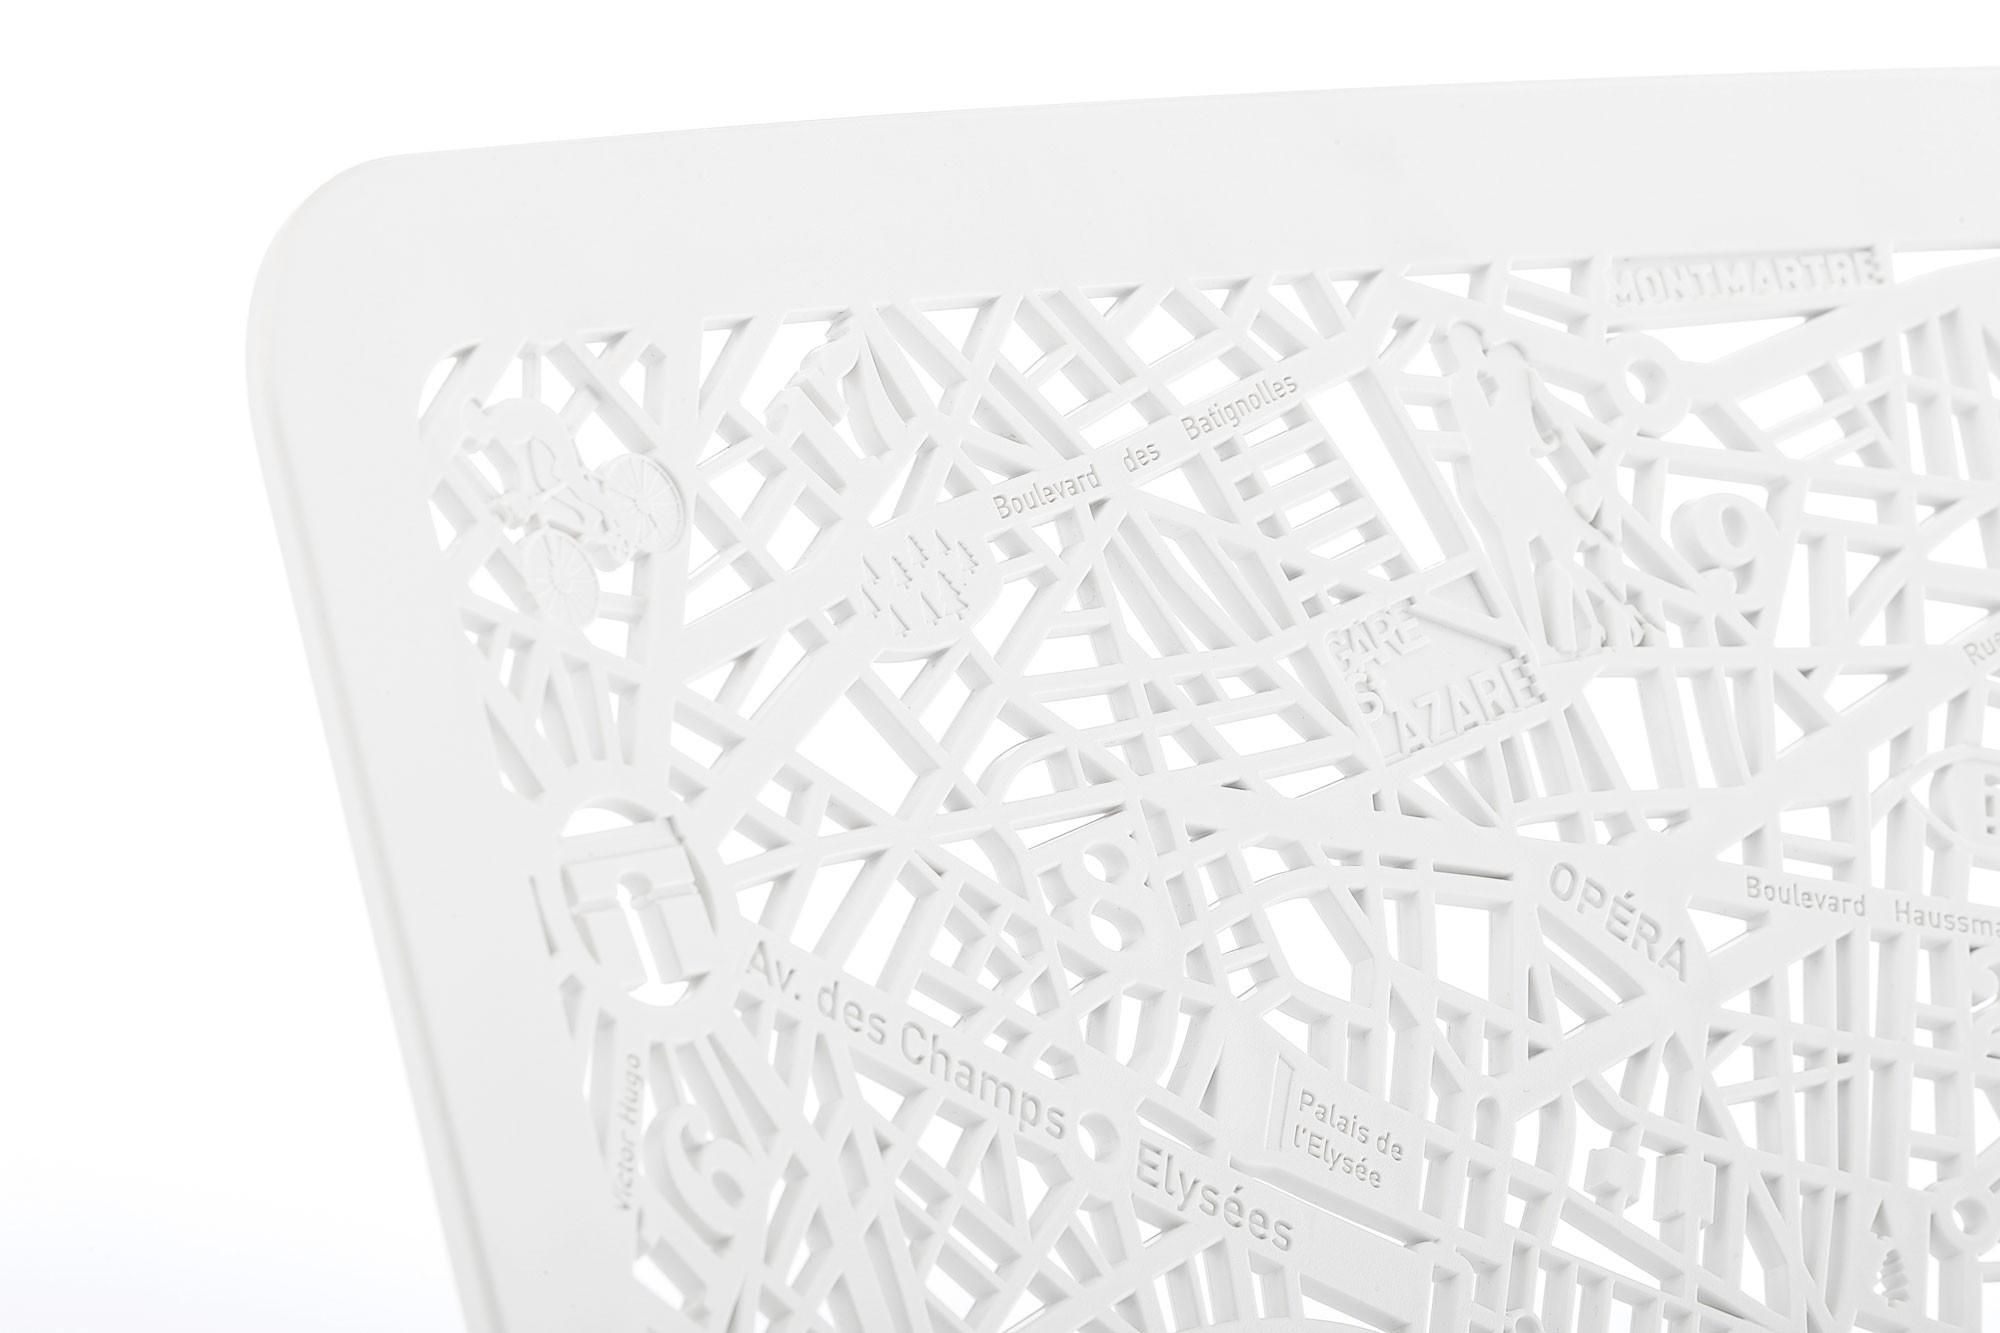 kettler gartenstuhl seine 0313306 5000 stapelbar kunststoff wei bei. Black Bedroom Furniture Sets. Home Design Ideas